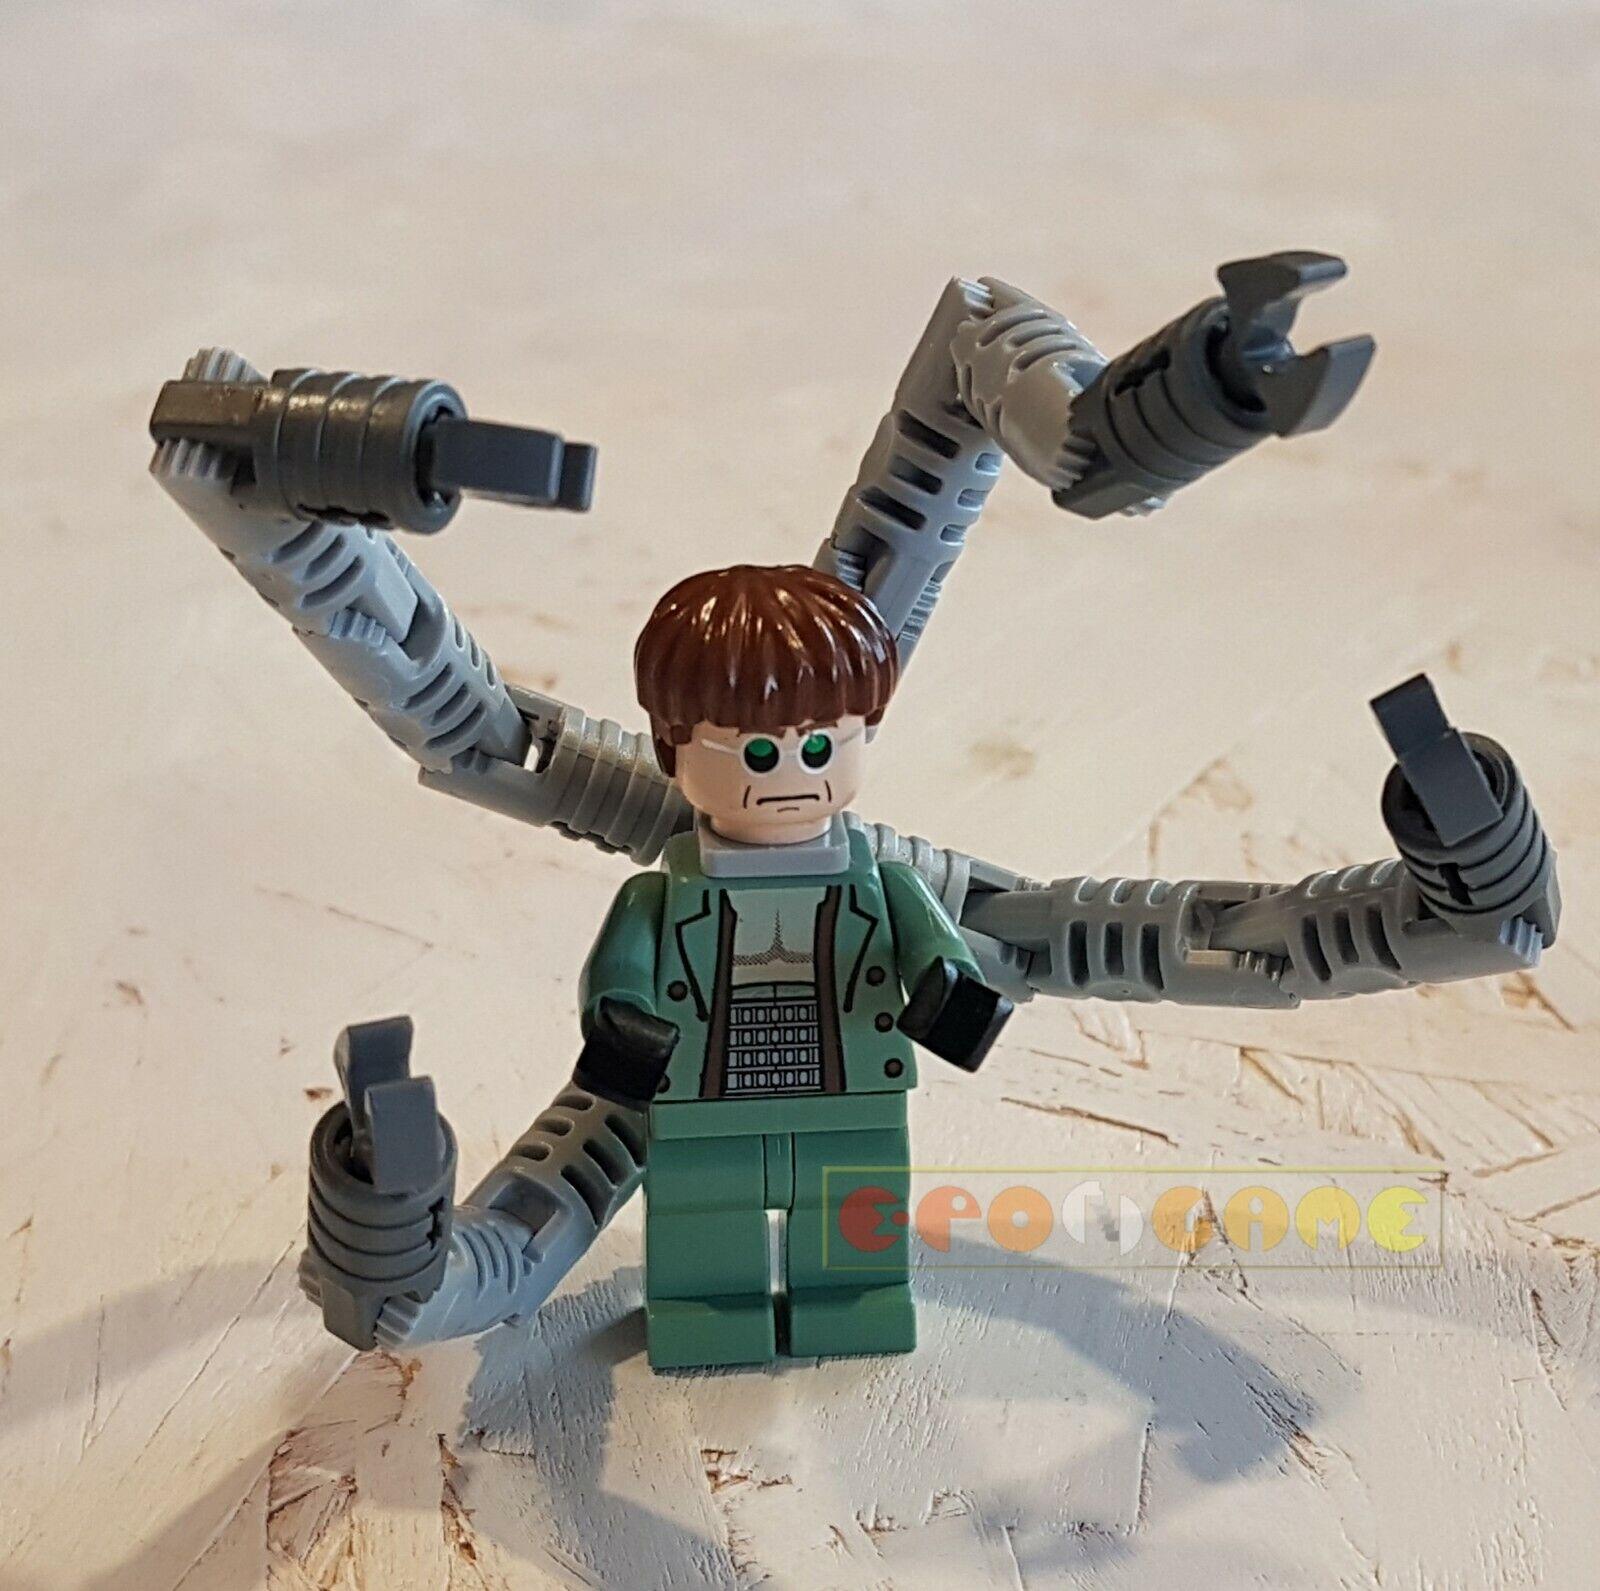 LEGO SPD026 - DR. OCTOPUS DOC OAK - Set Spider-Man 4854 - OTTIMO USATO GU